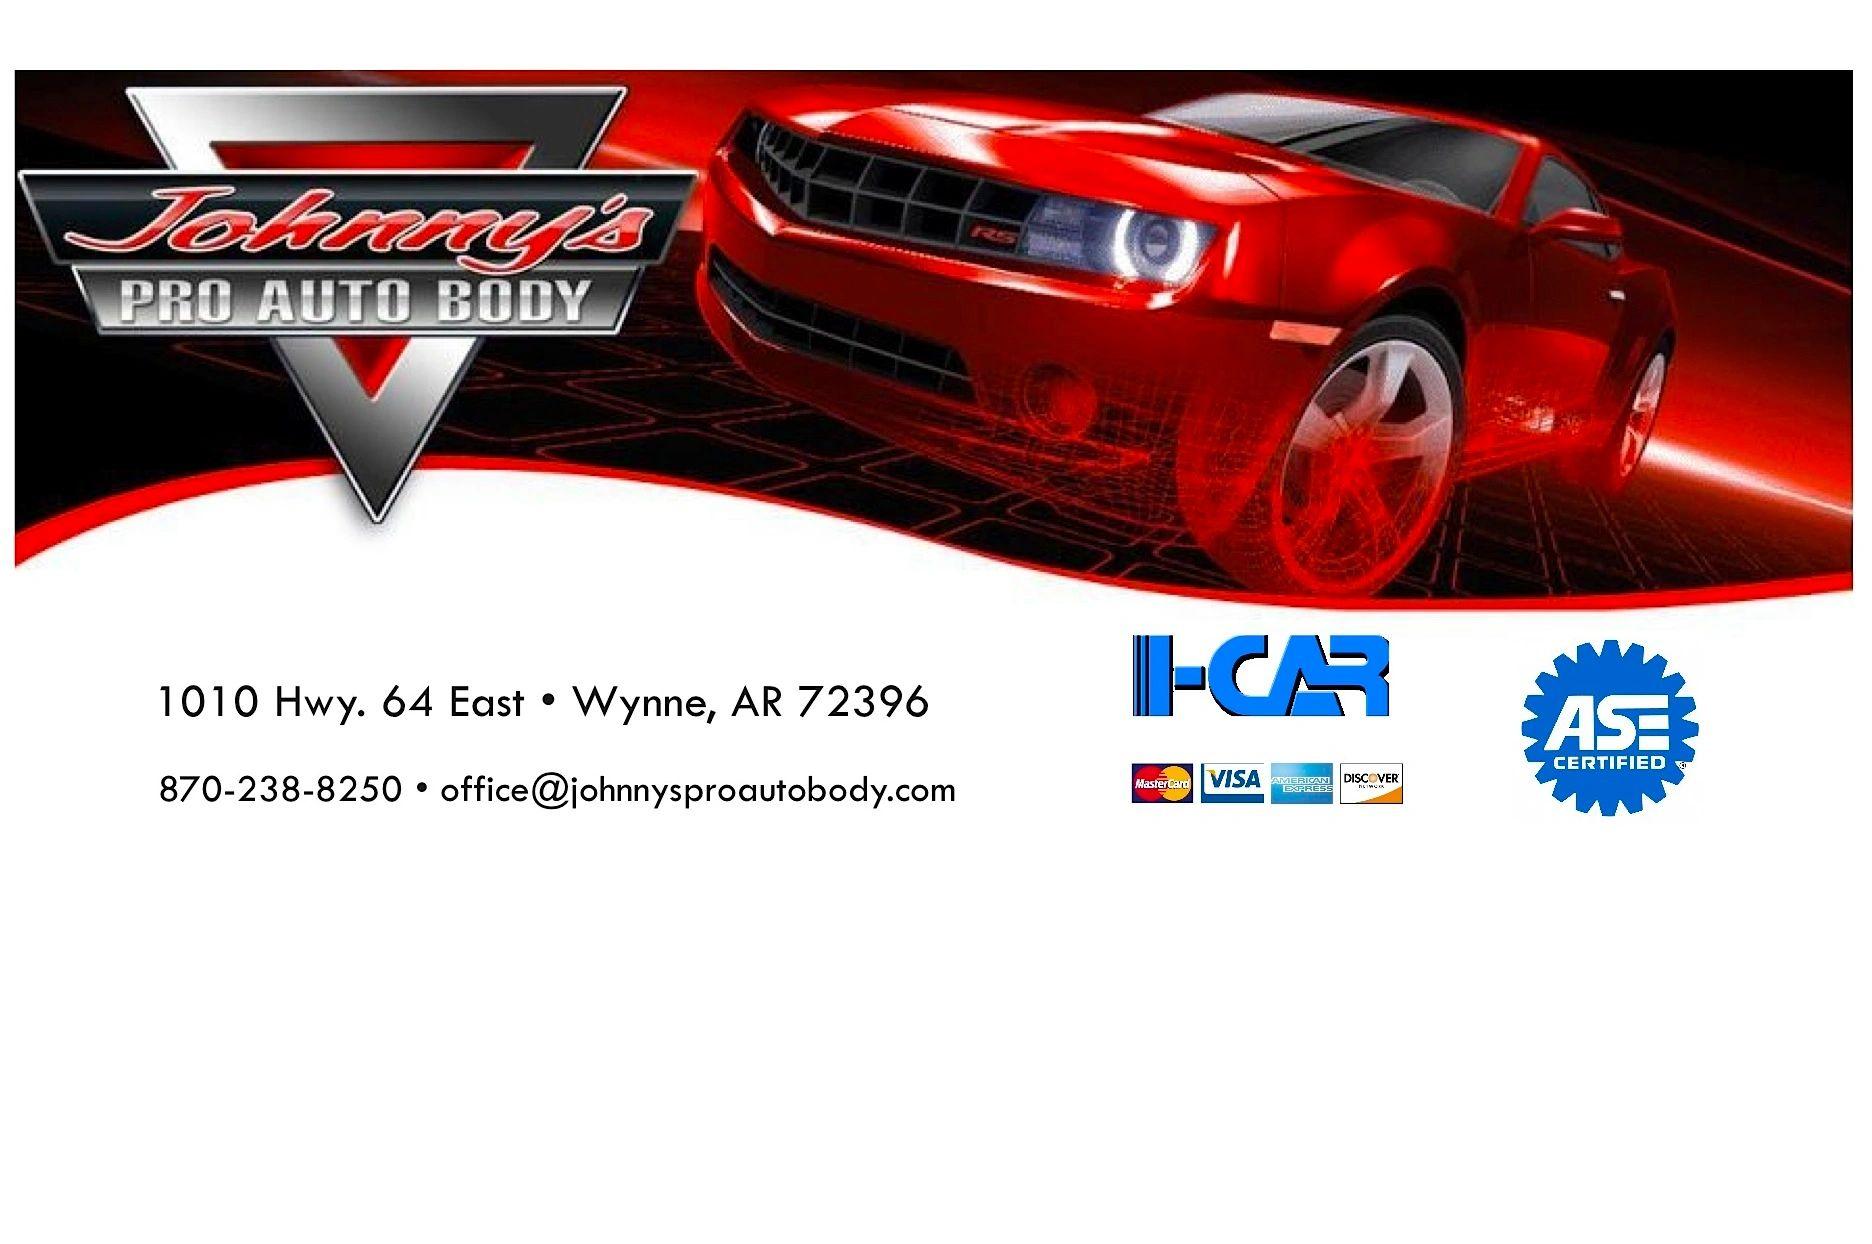 Johnnys Pro Auto Body